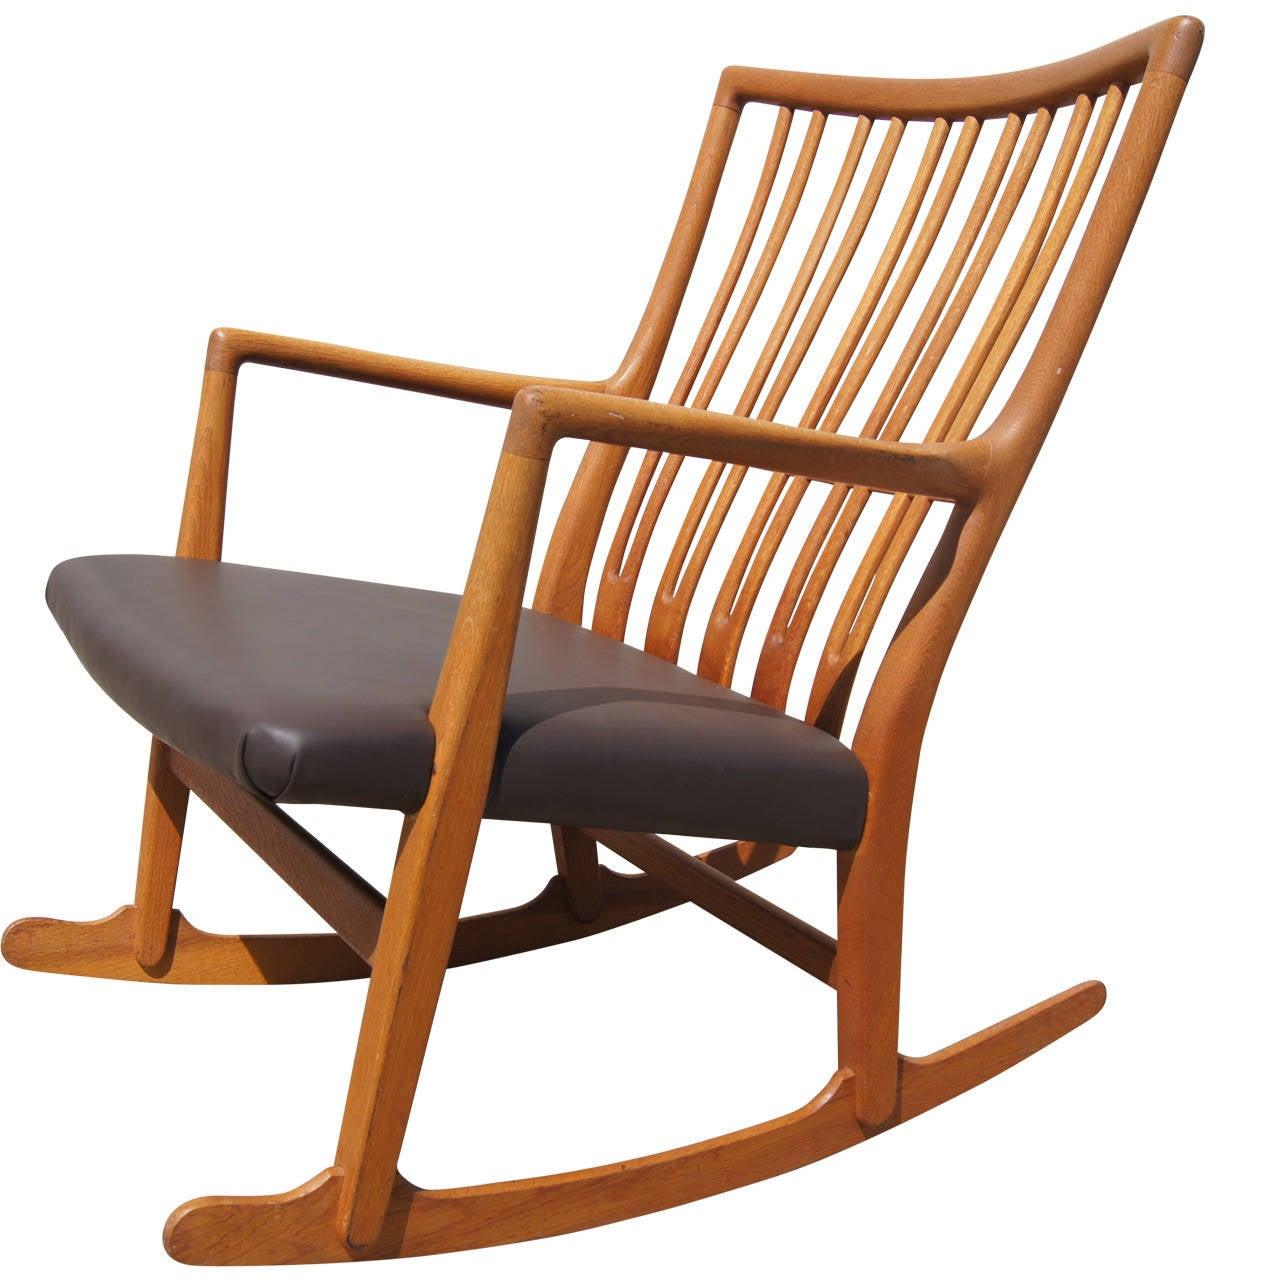 Benny Linden Teak Chairs Images Medium Size